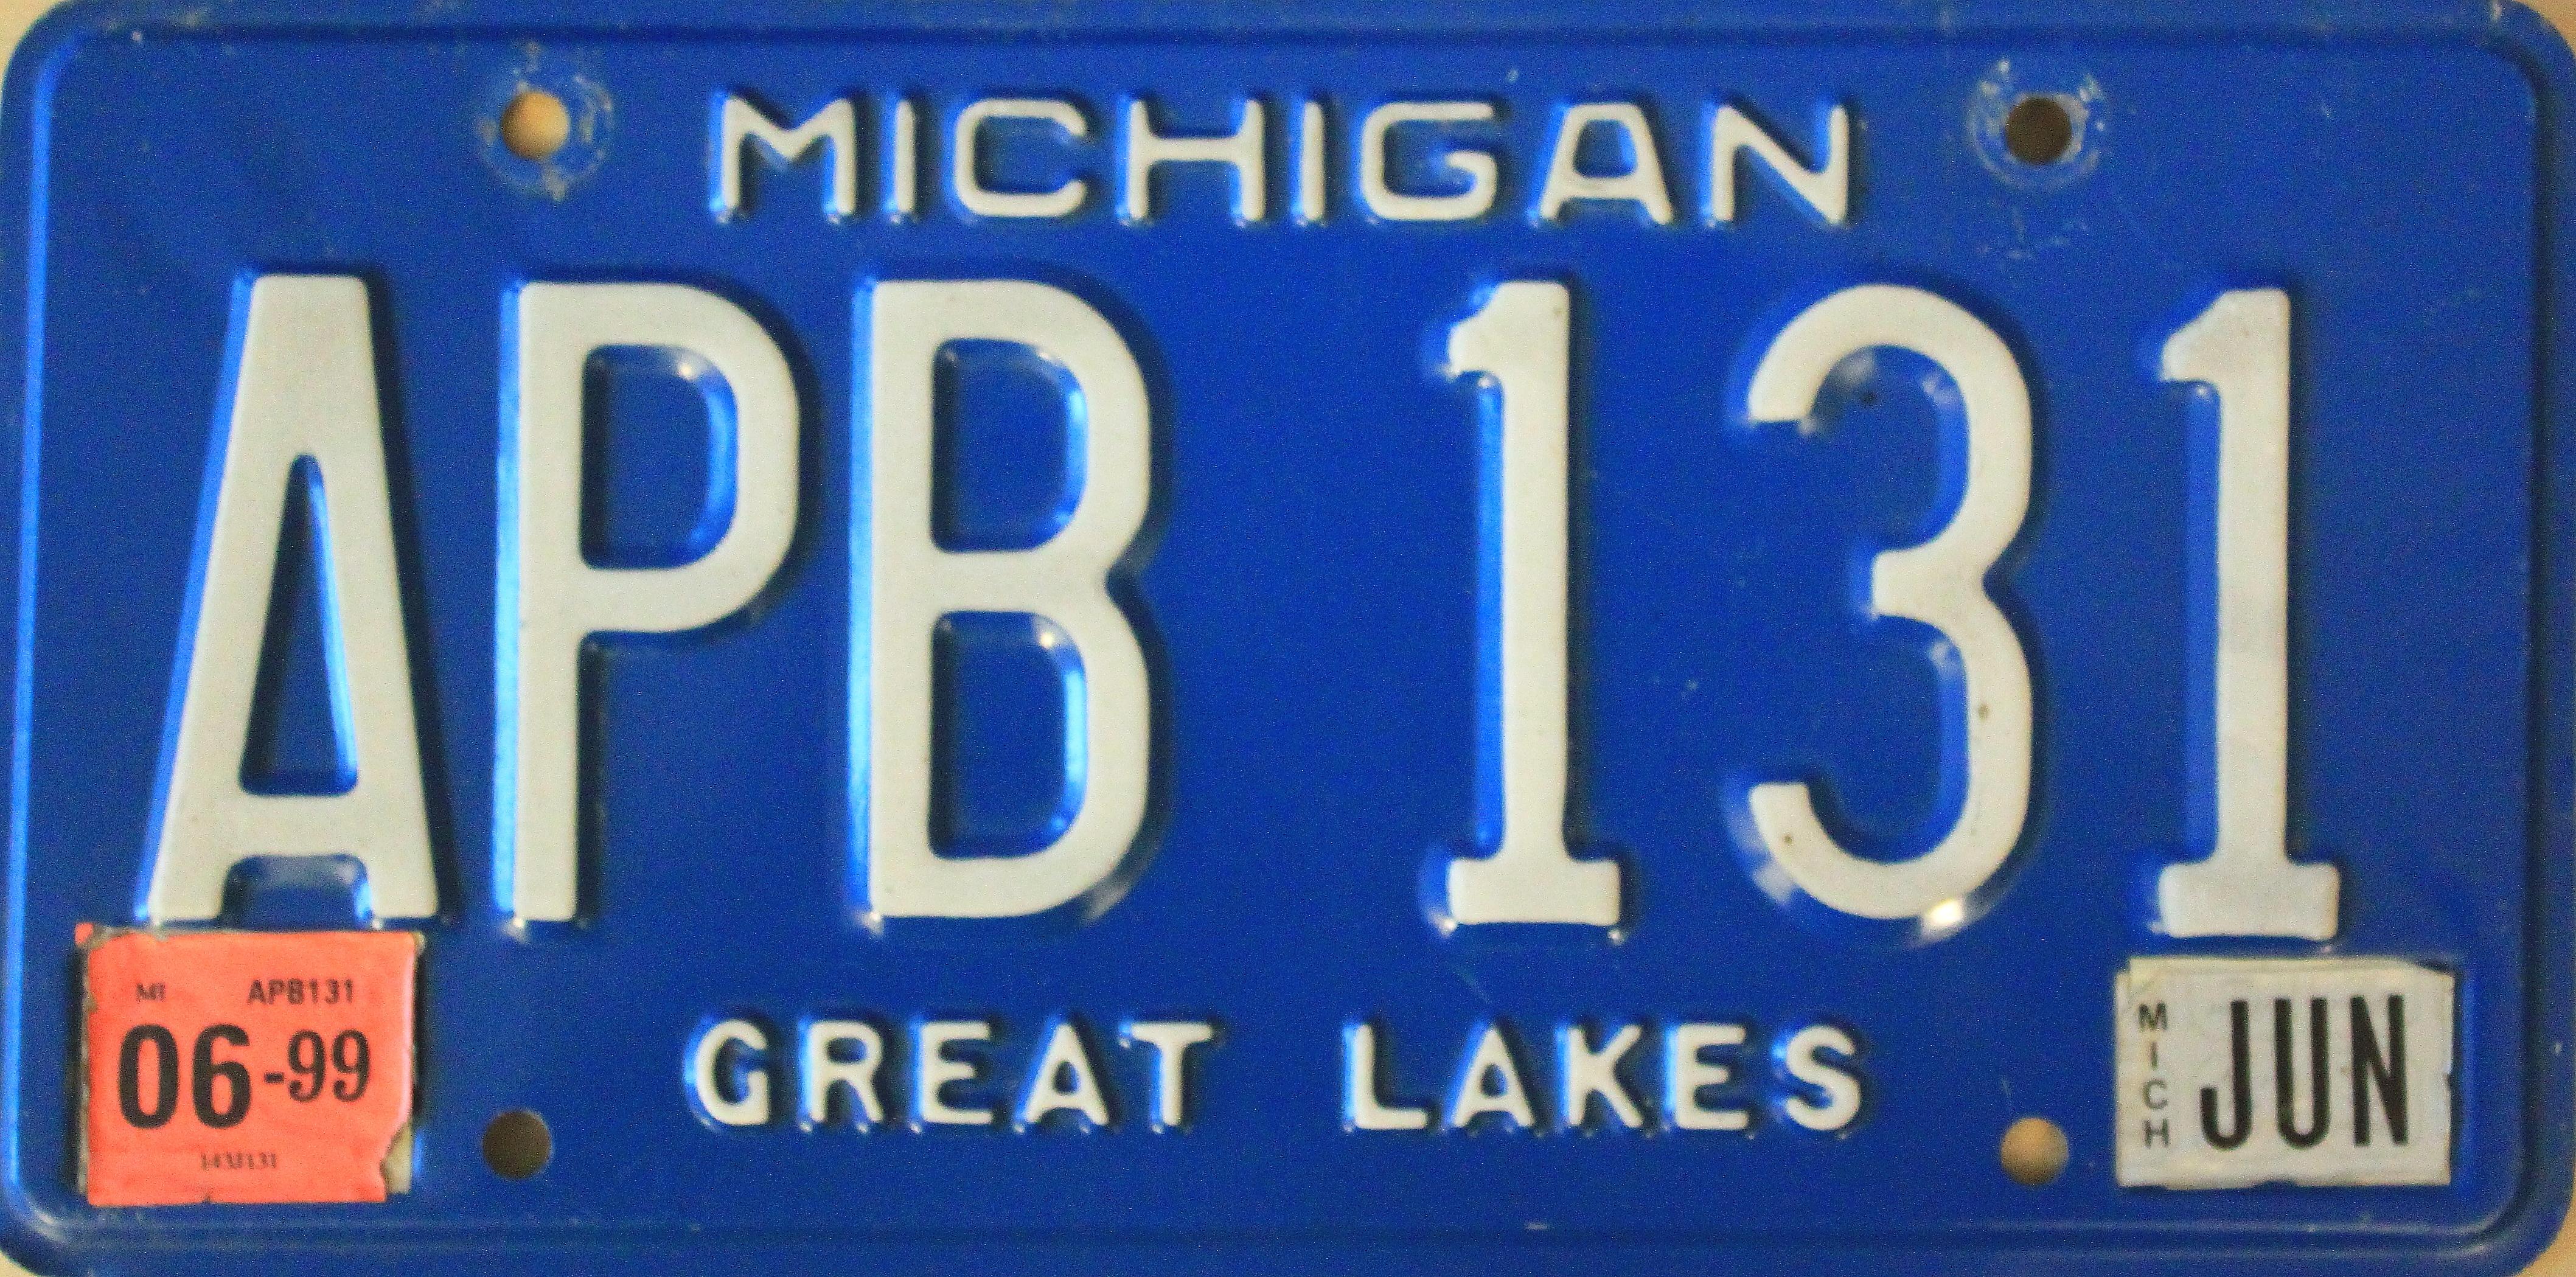 File:Michigan License Plate APB 131.JPG - Wikimedia Commons